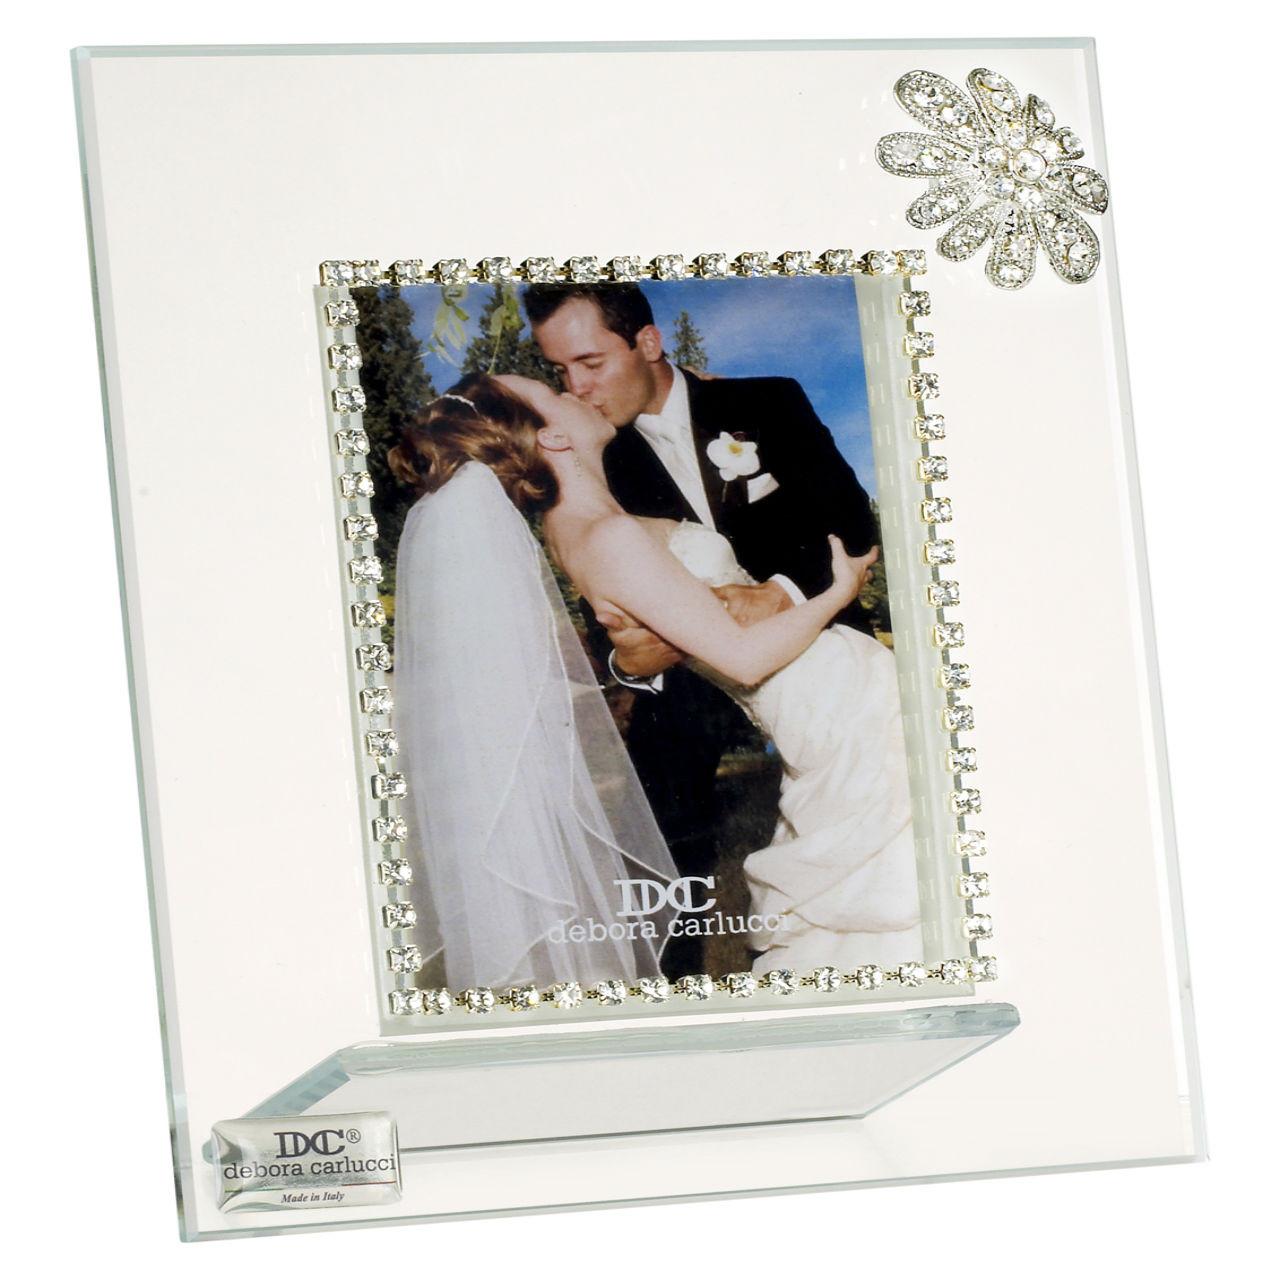 Italian Crystal Photo Frame Wedding Gifts I 5thavestore